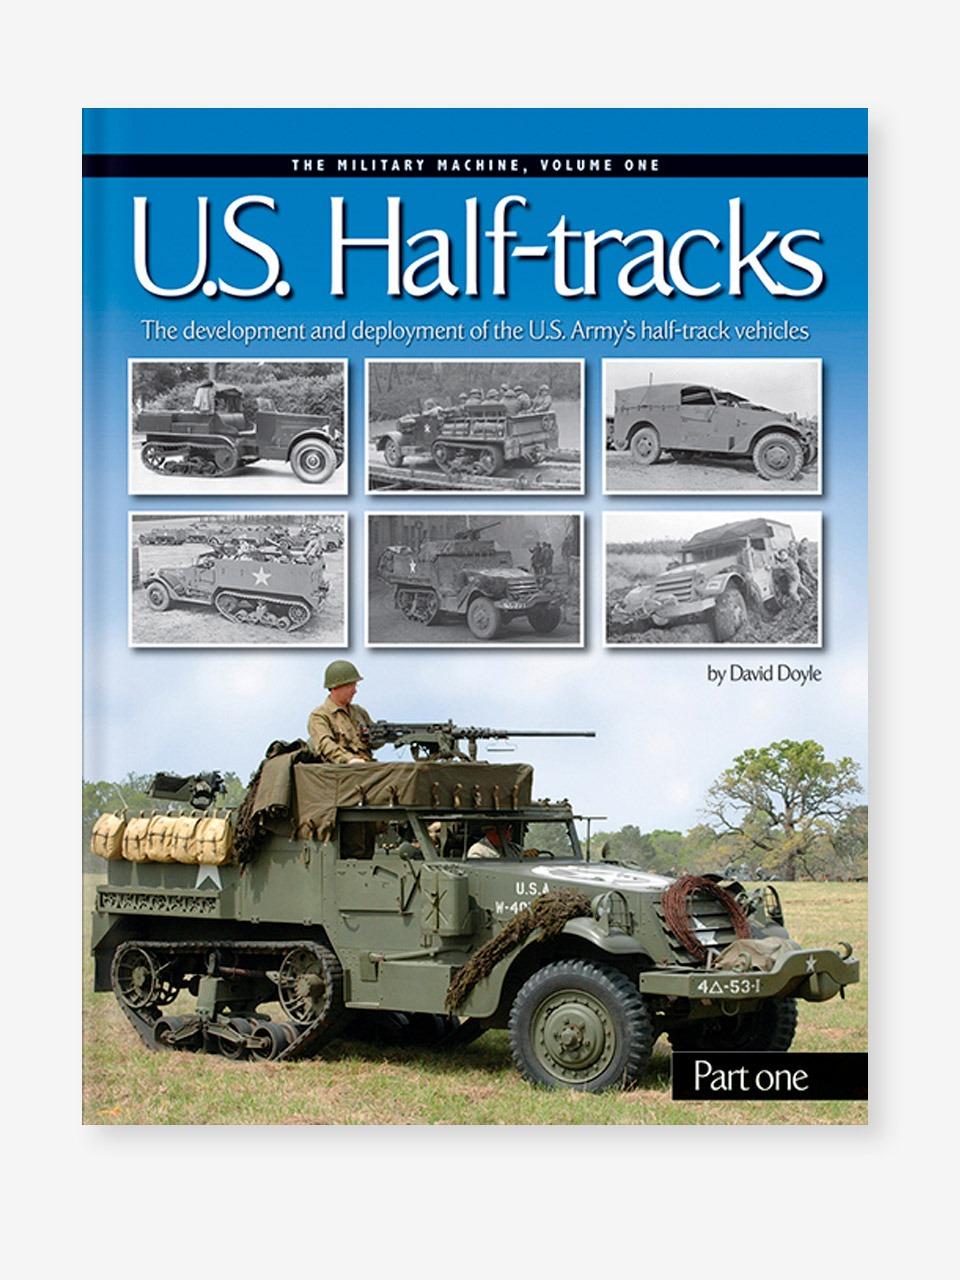 US Half-tracks vol 1